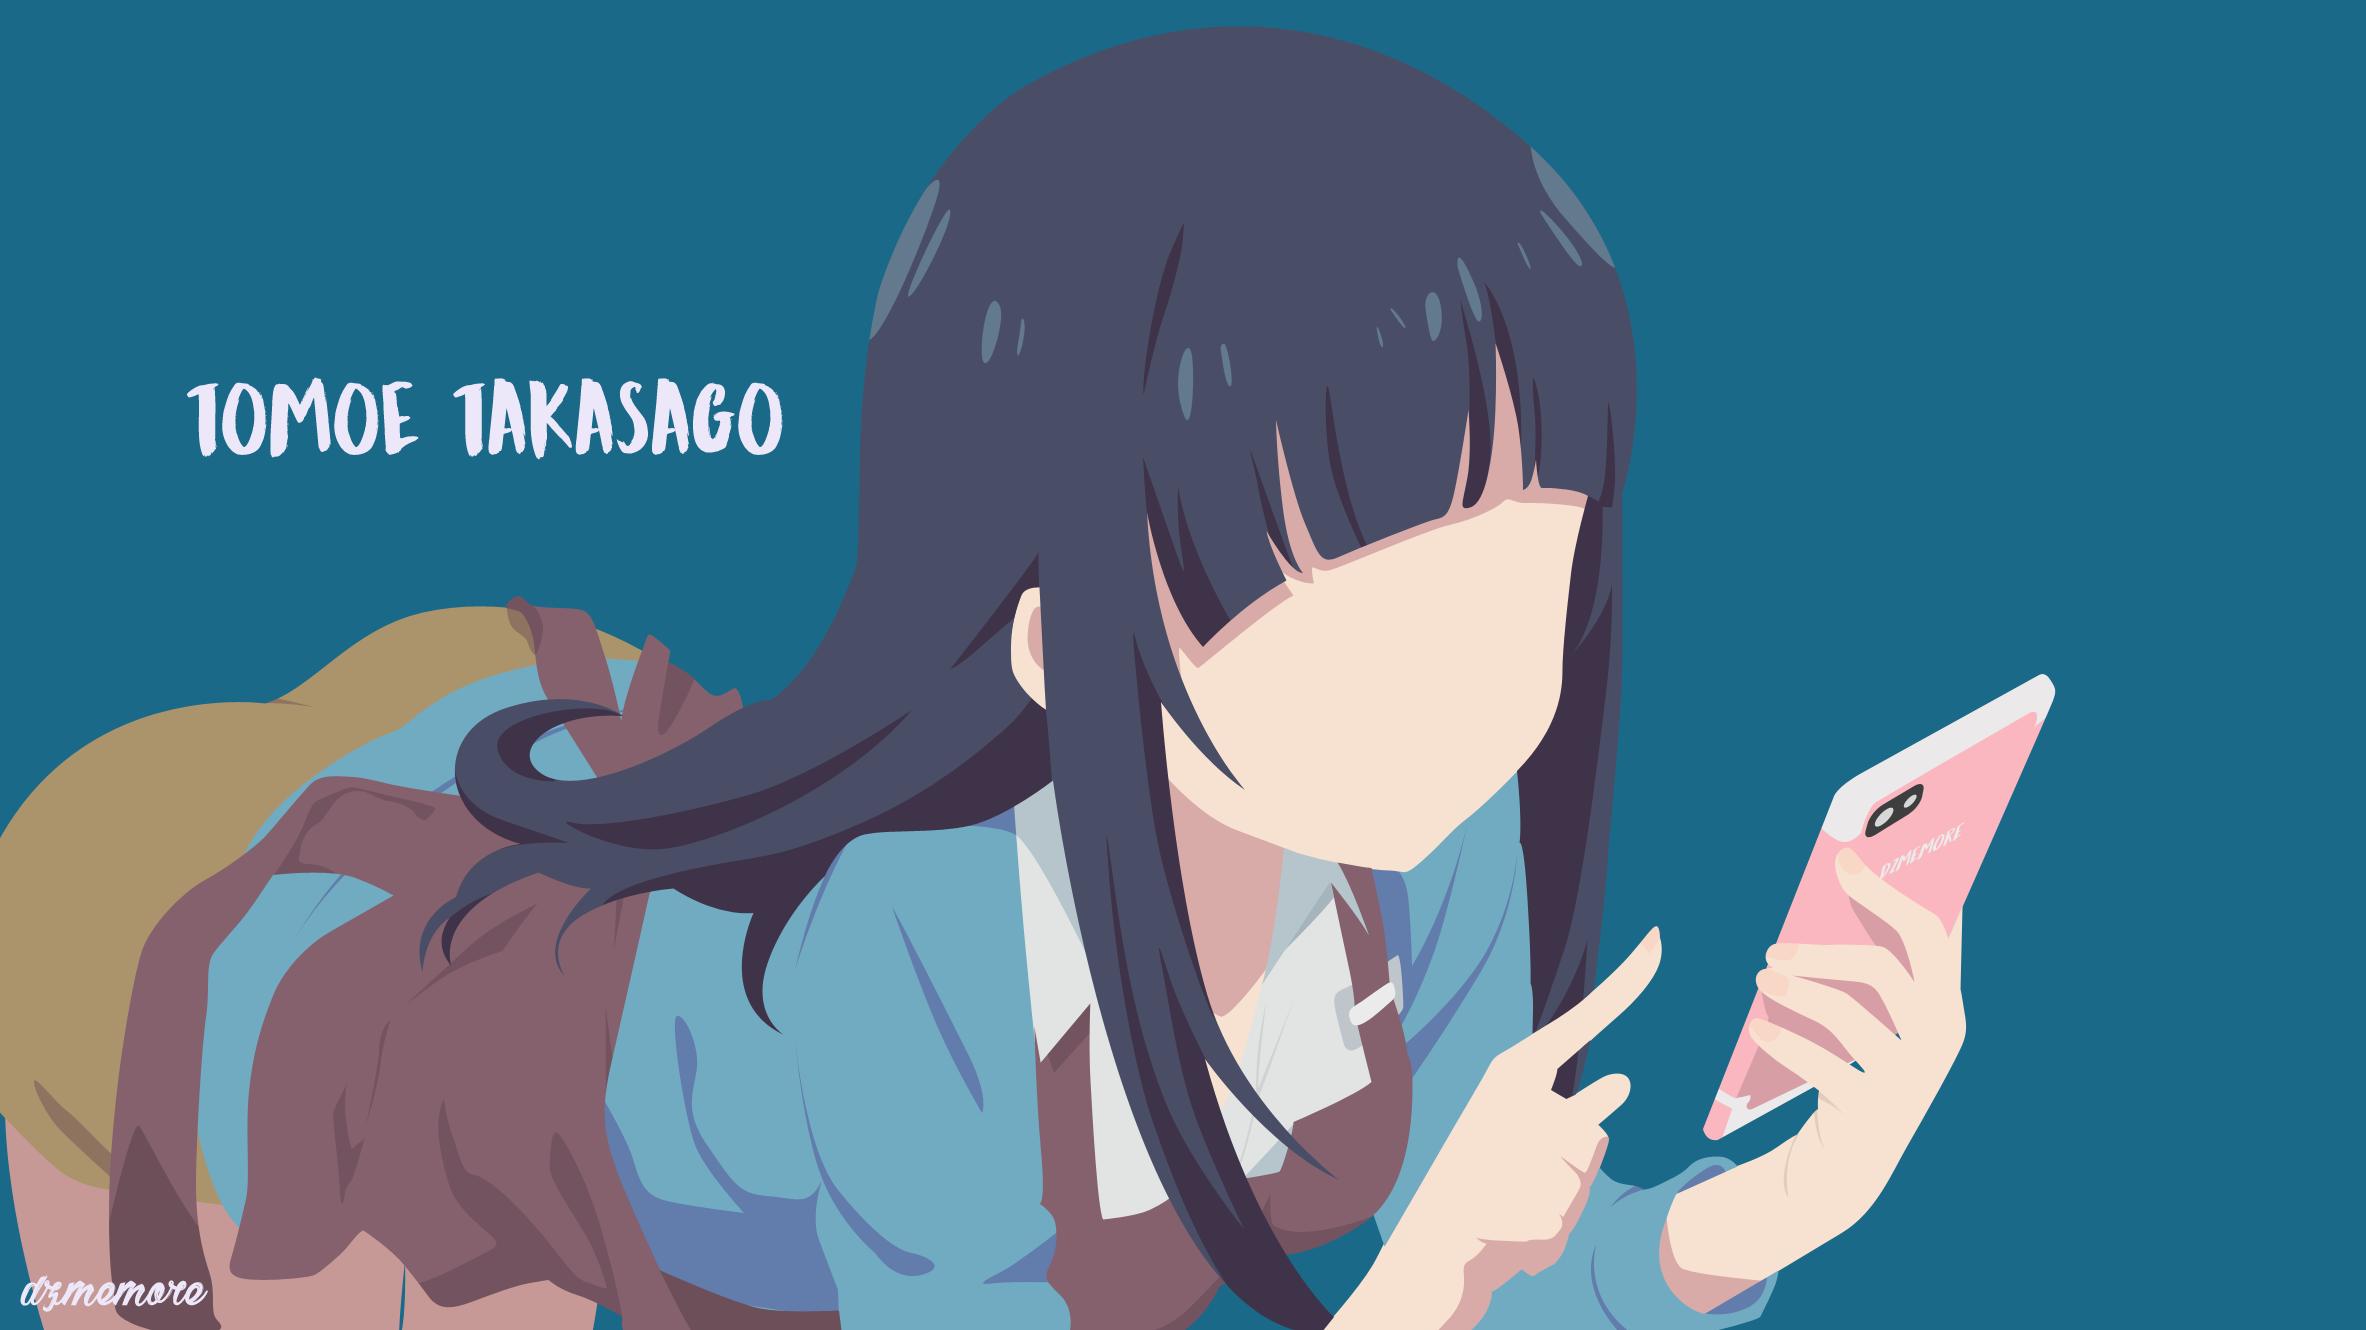 Eromanga Sensei Anime Girls Takasago Tomoe 2366x1330